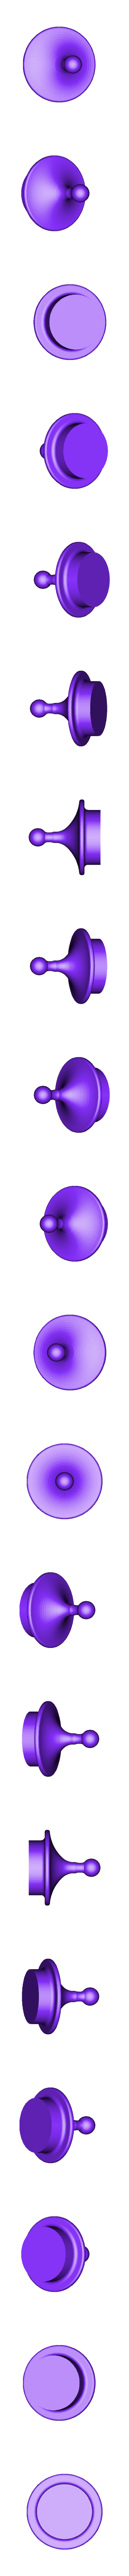 GrolschTopWithoutHole.stl Download free STL file Grolsch Cafe Lamp Top • 3D printer design, 3DWP